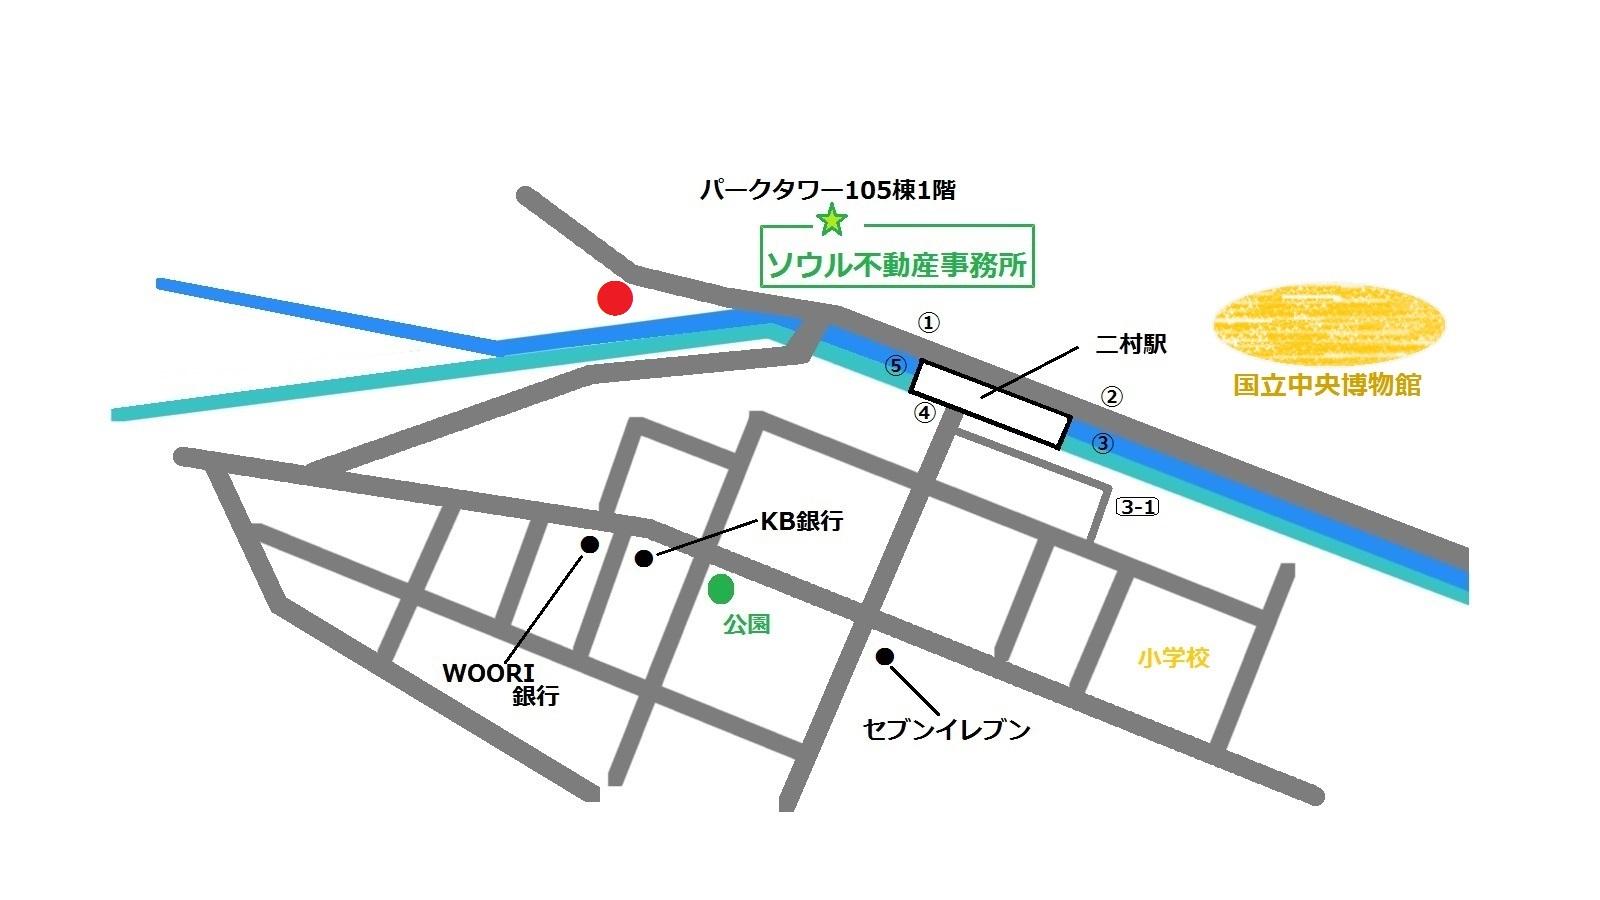 LEGOディスカウントショップ 地図